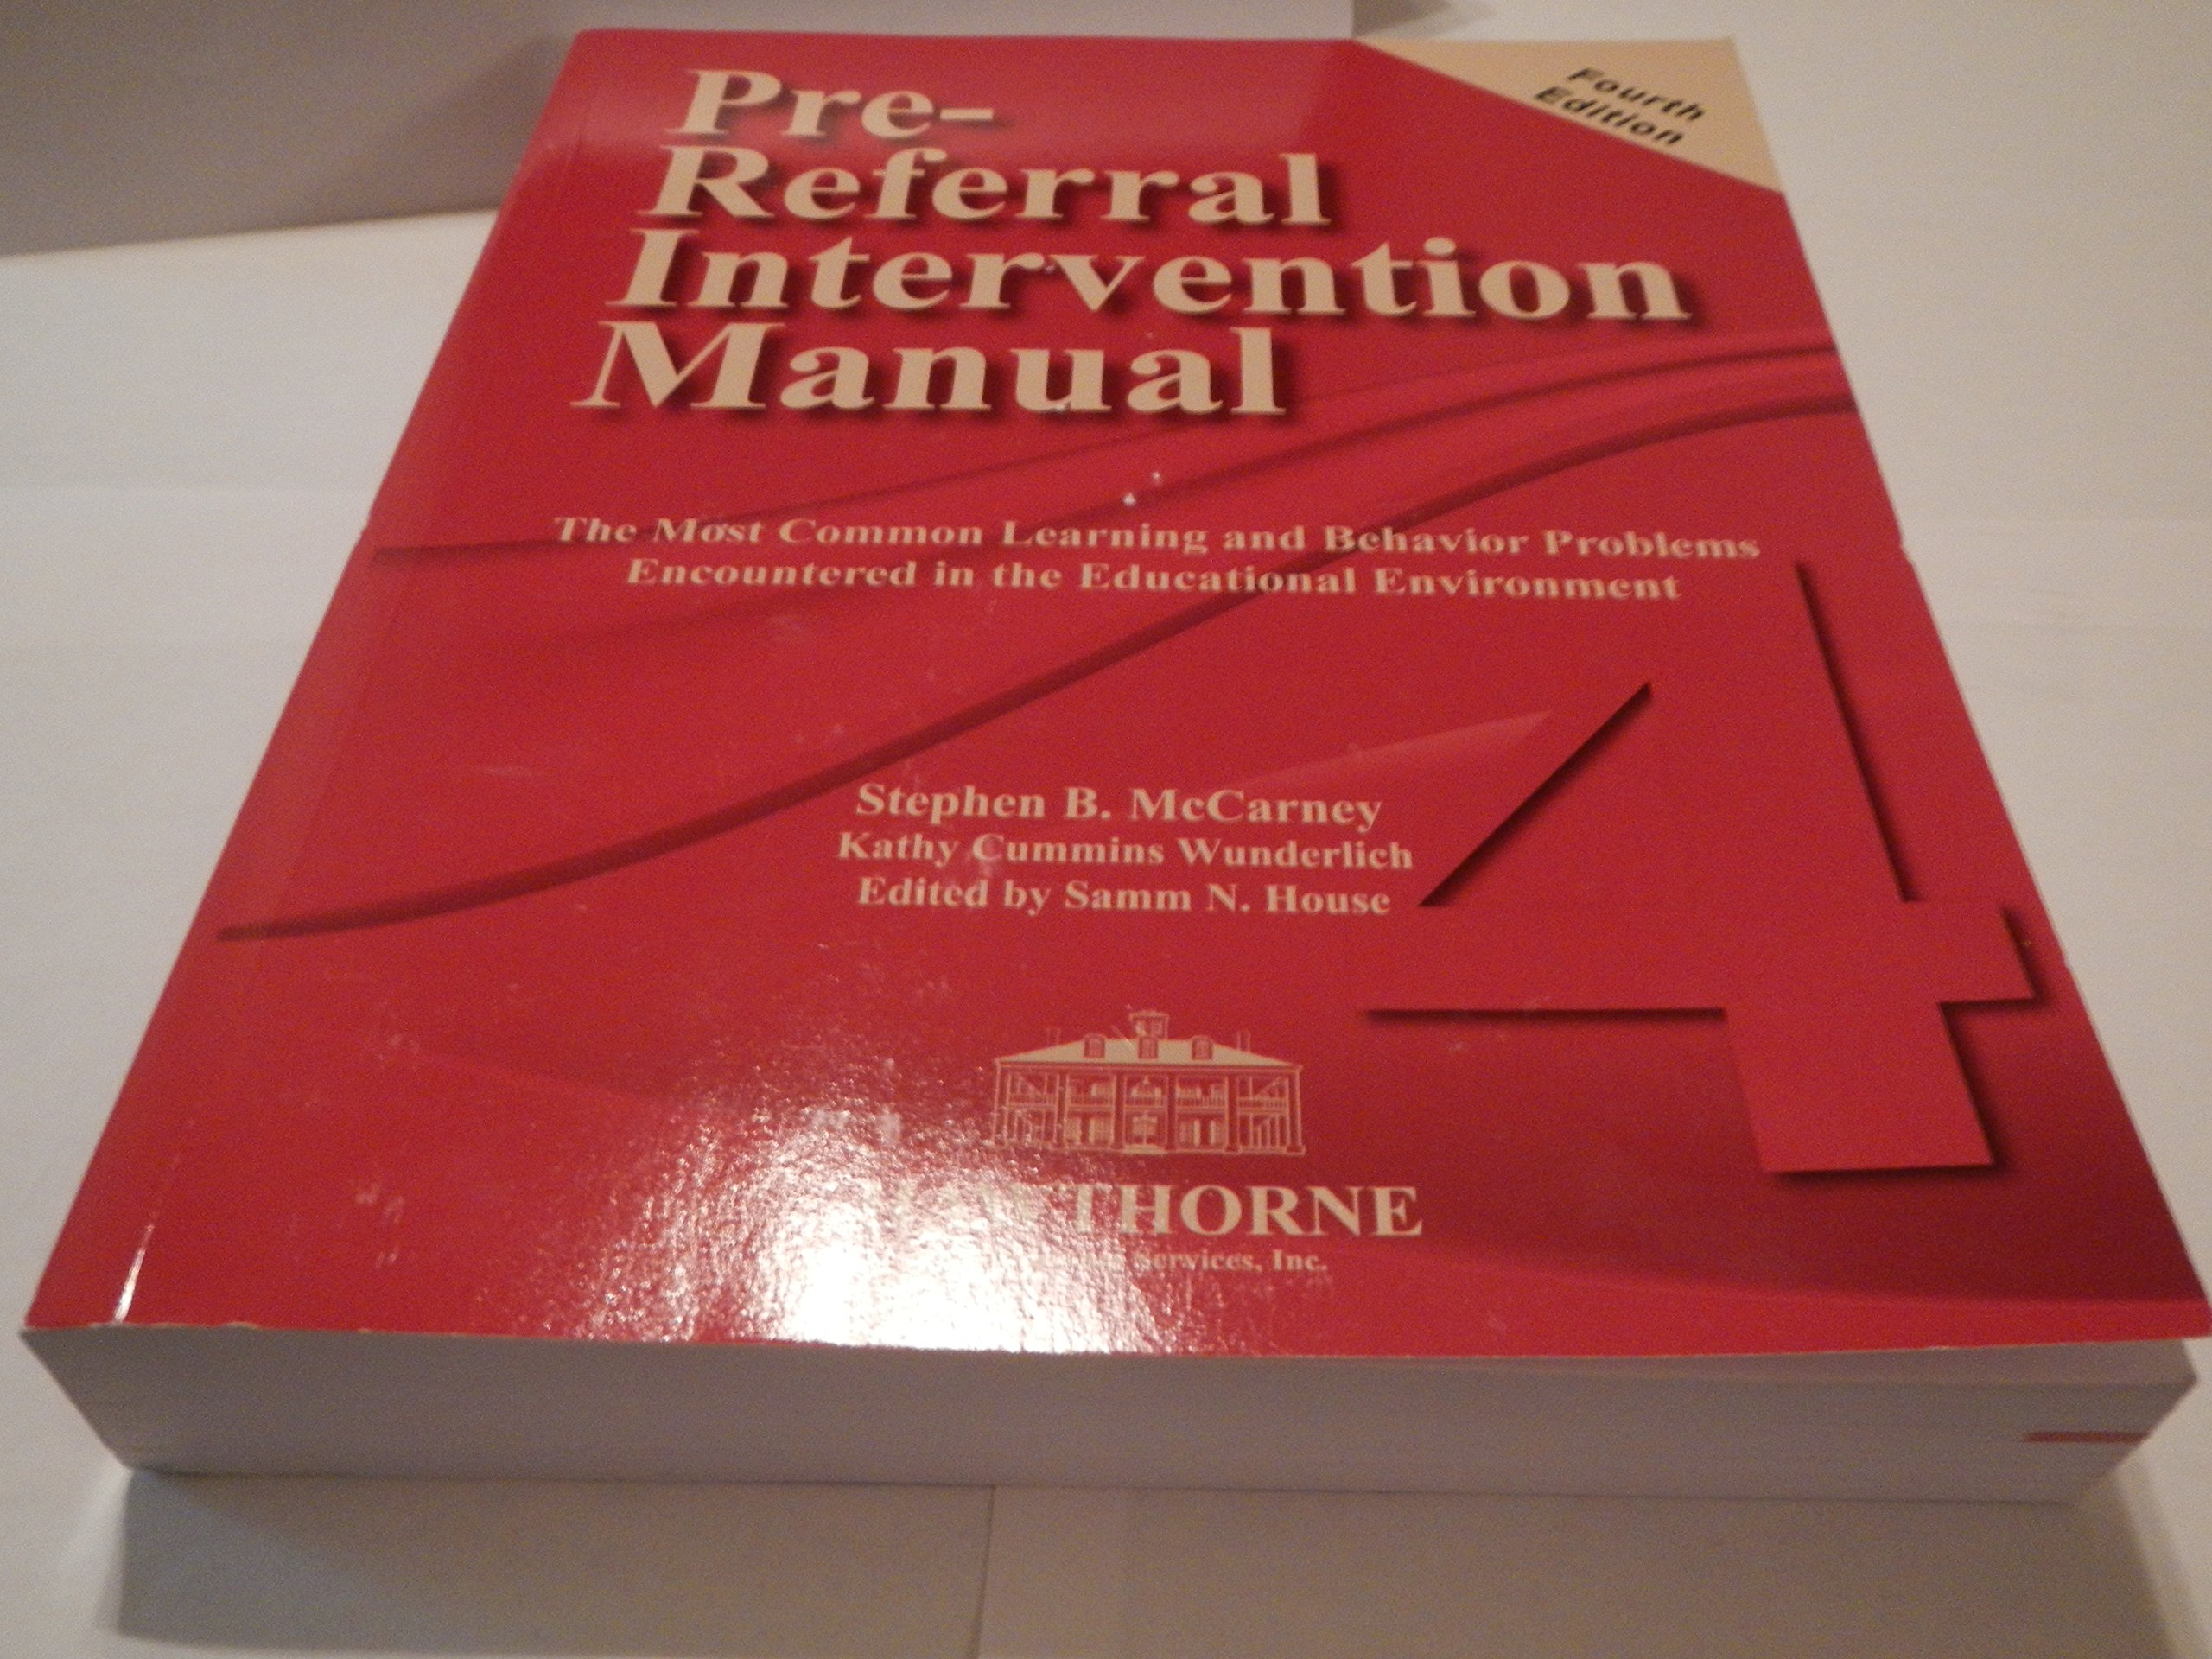 pre referral intervention manual fourth edition kathy cummins rh amazon com pre-referral intervention manual 4th edition pre referral intervention manual 4th edition pdf